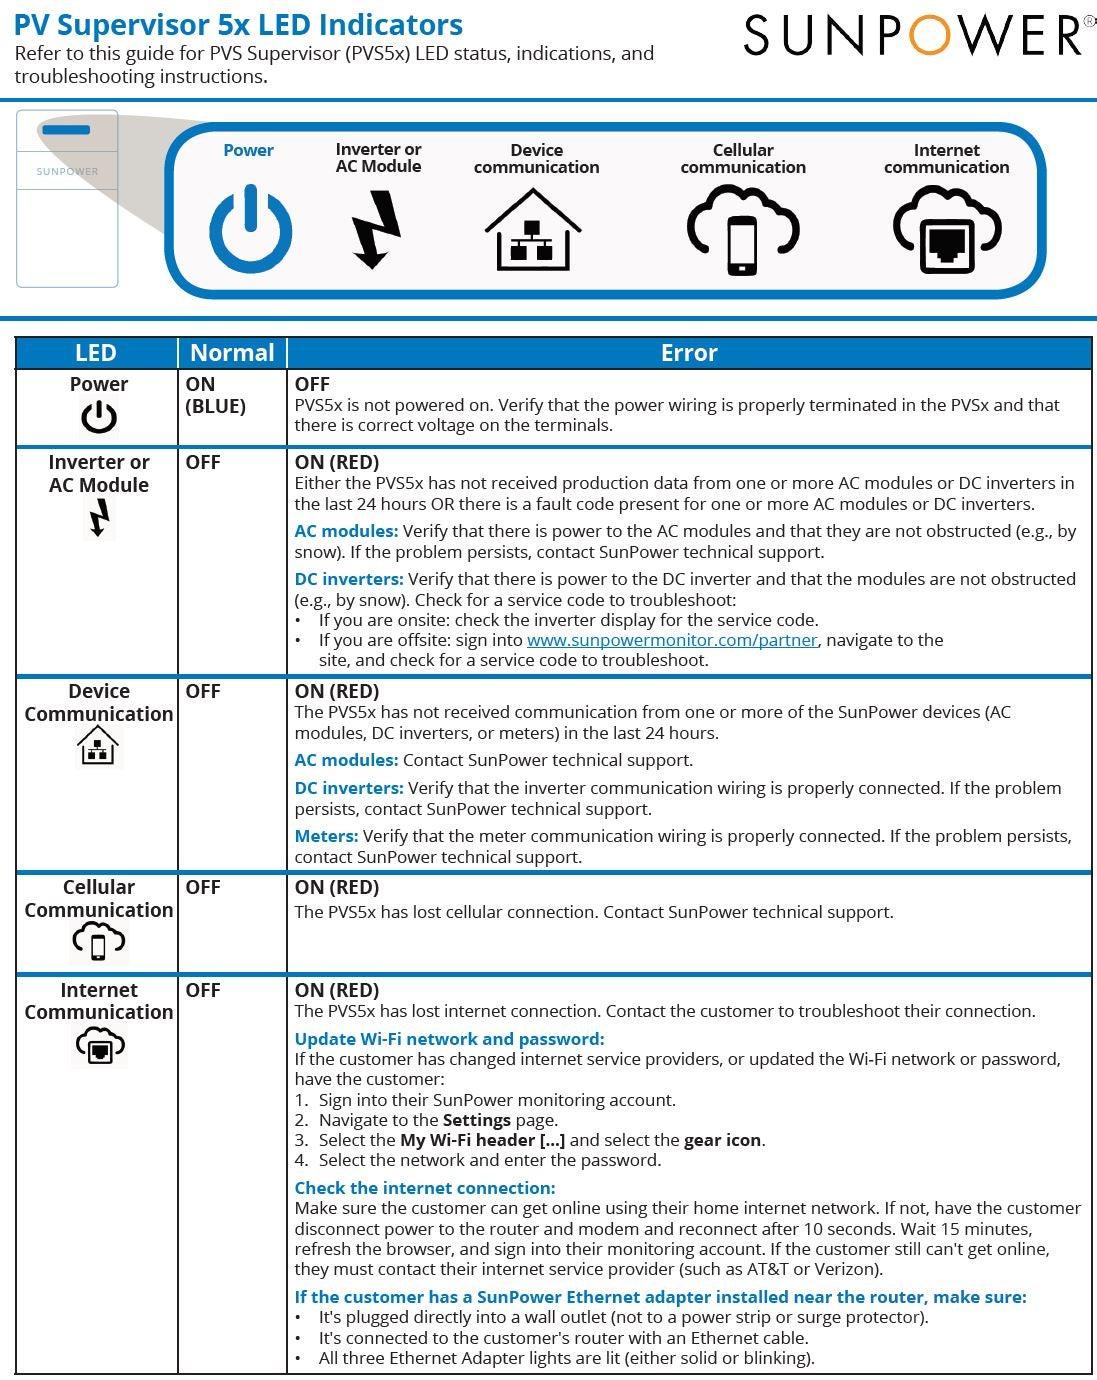 PVS5x LED Indicators